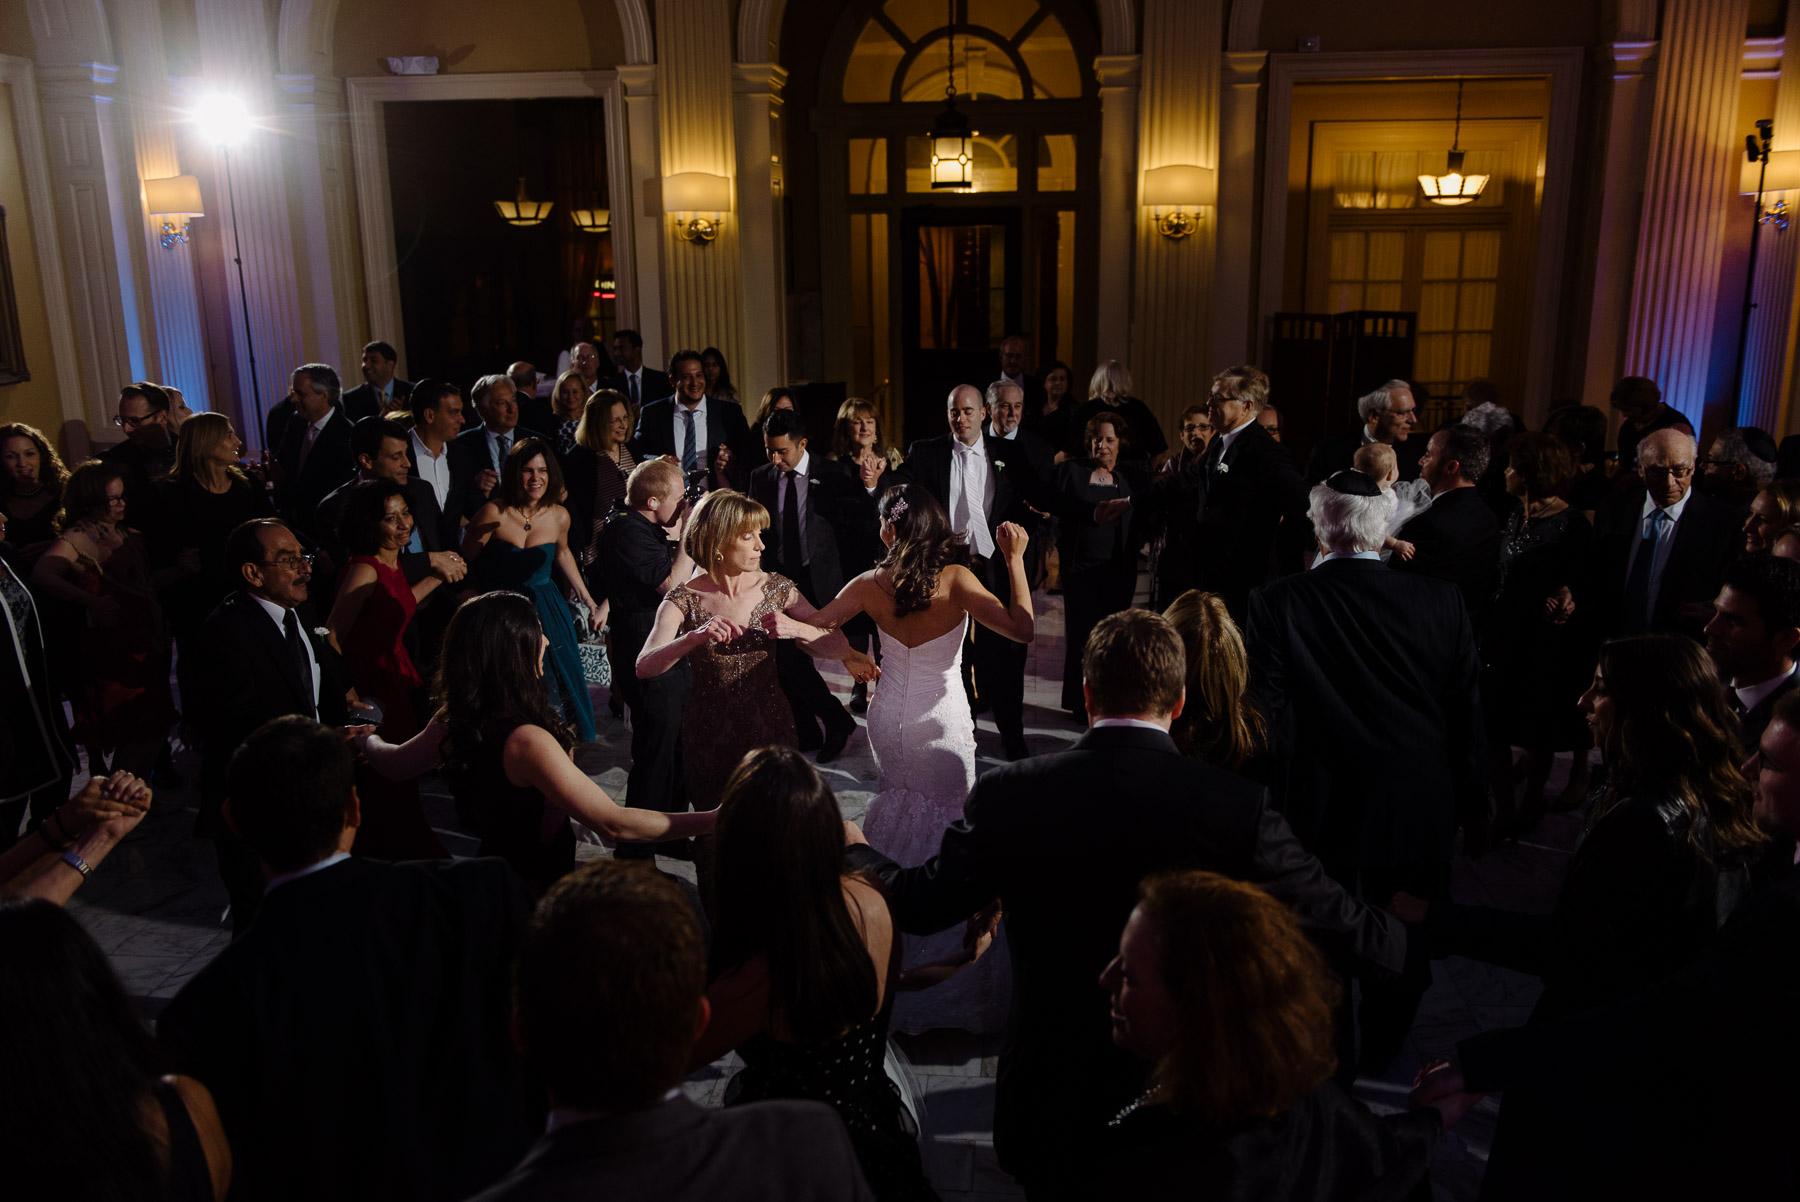 racquet-club-philadelphia-wedding-50.jpg